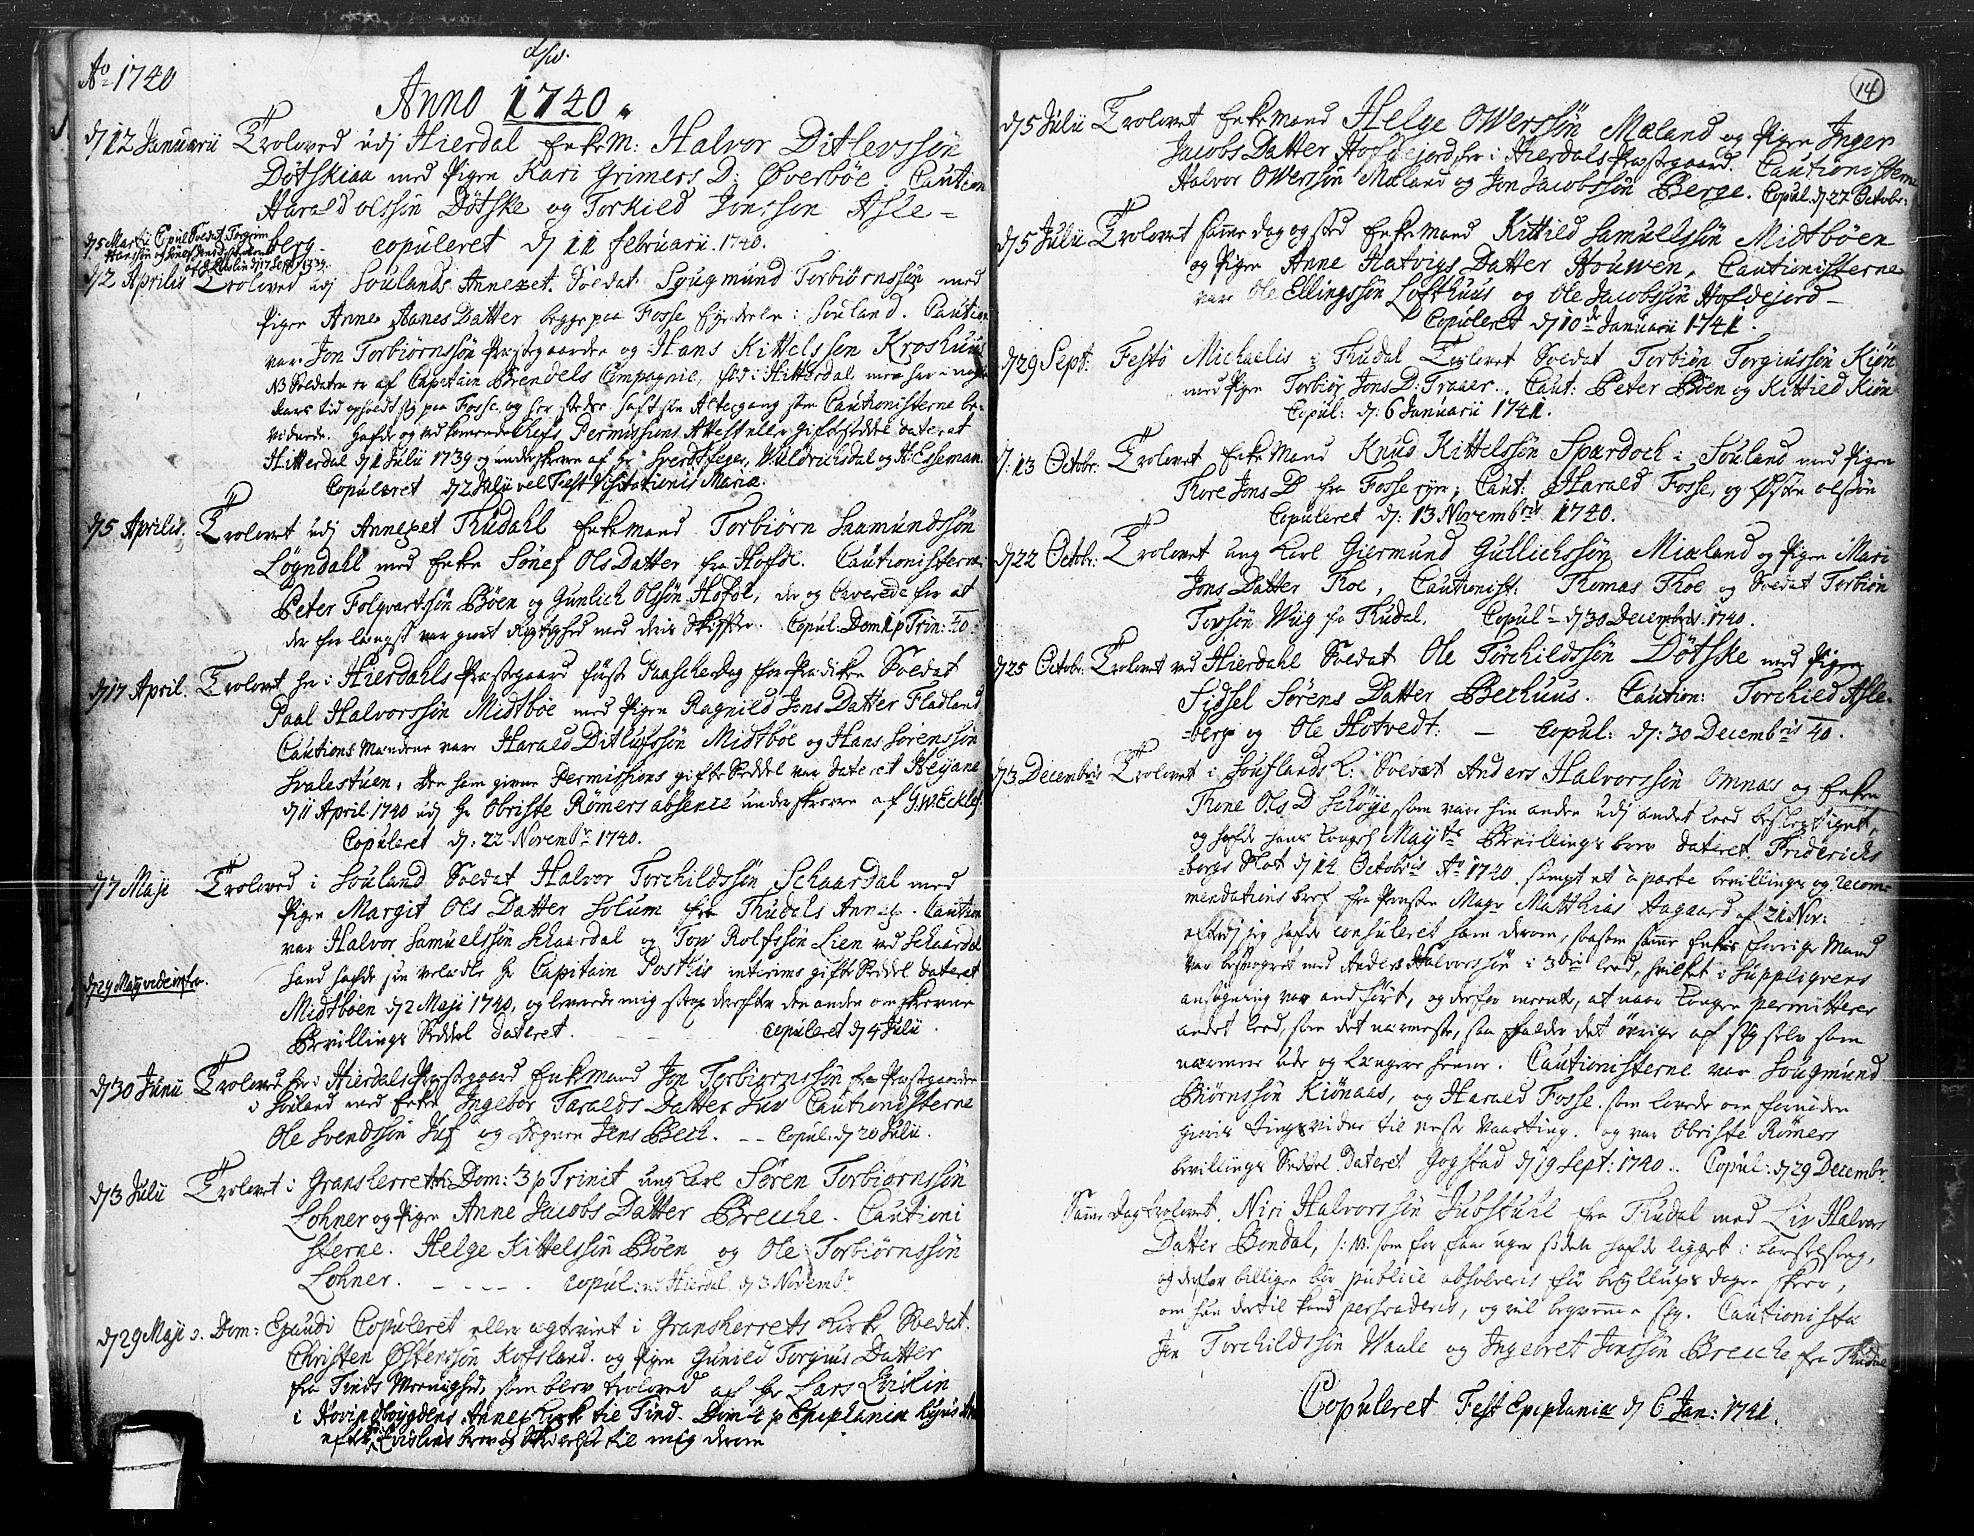 SAKO, Hjartdal kirkebøker, F/Fa/L0004: Ministerialbok nr. I 4, 1727-1795, s. 14